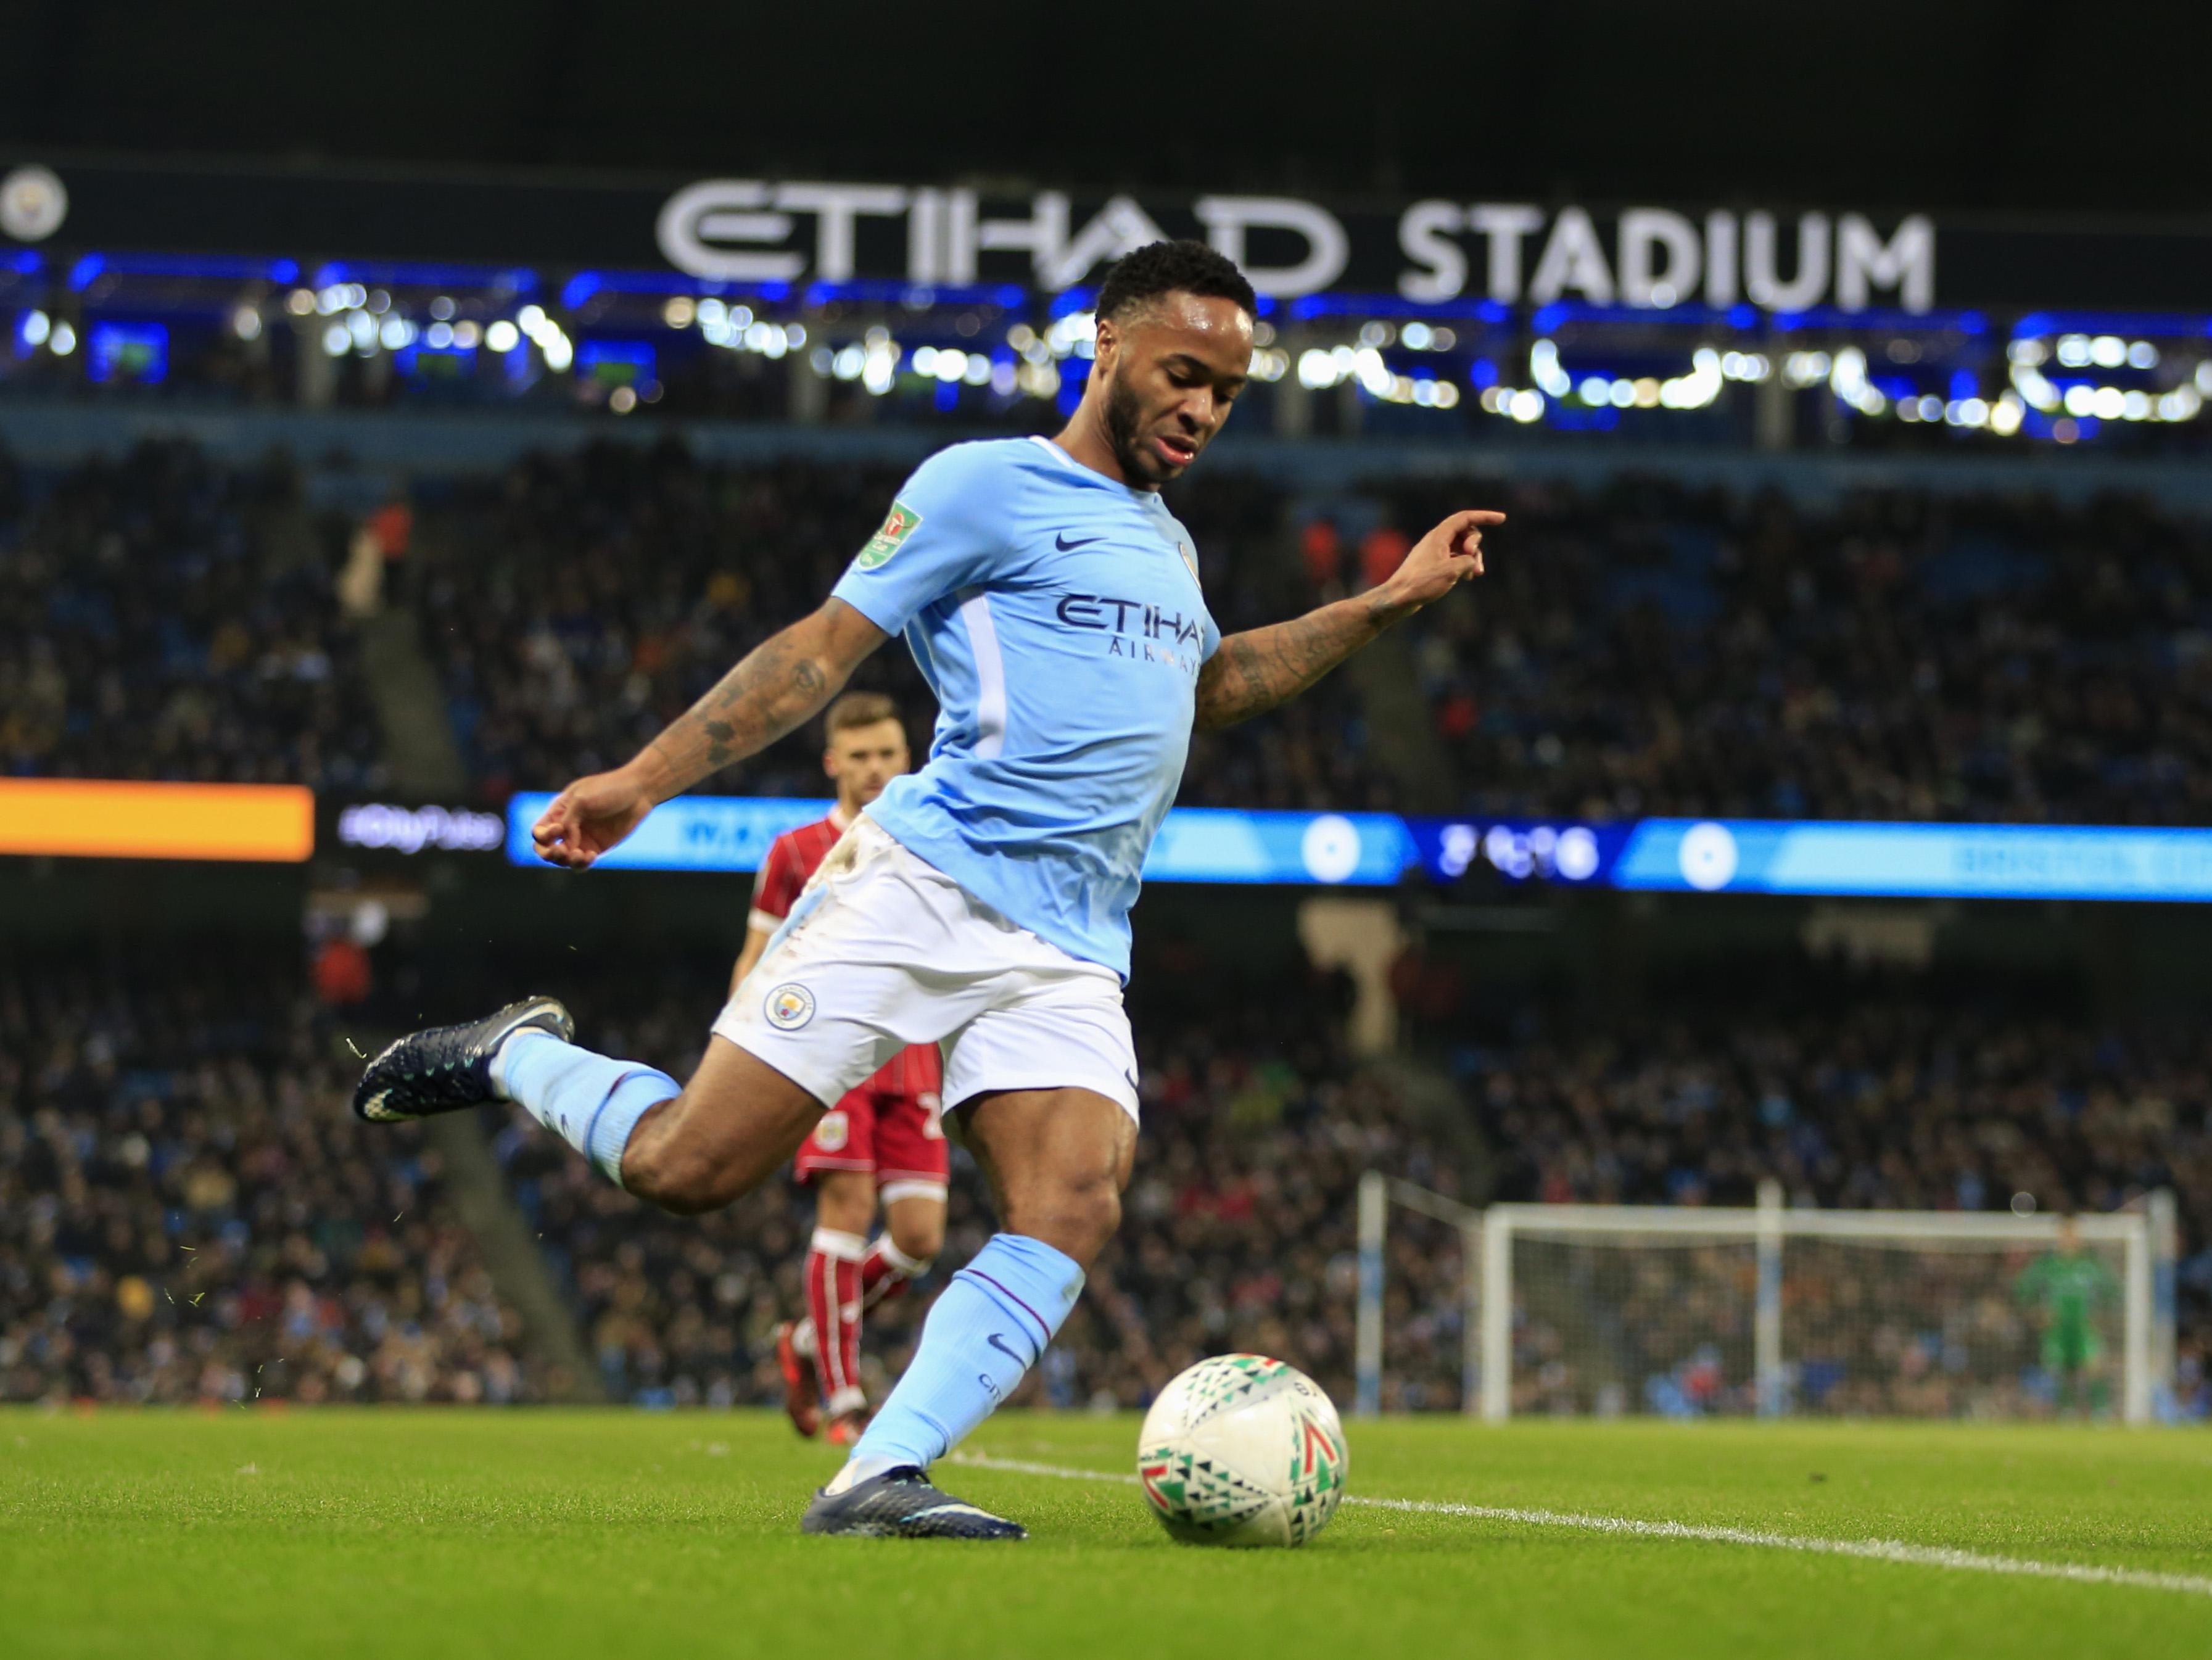 Football - Etranger - Premier League : Everton - Manchester City en direct